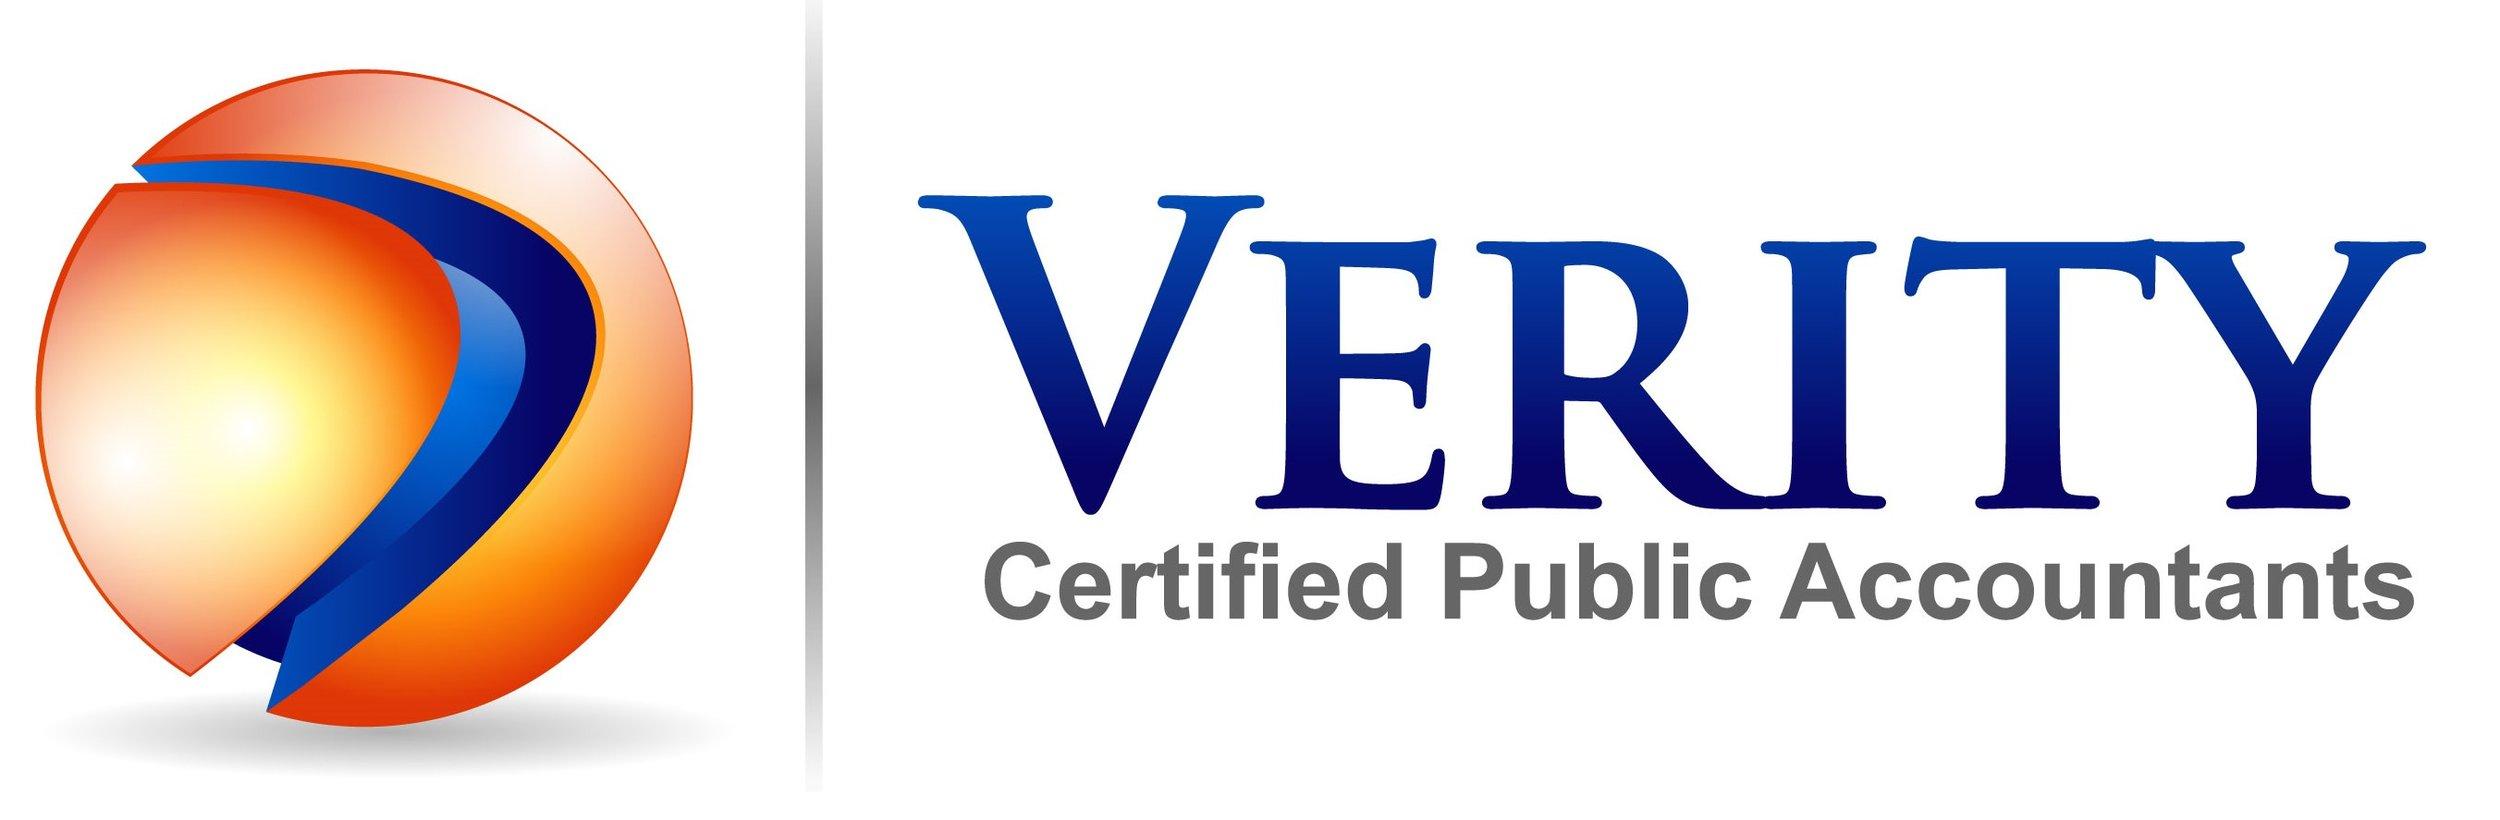 Verity - vector file.jpg